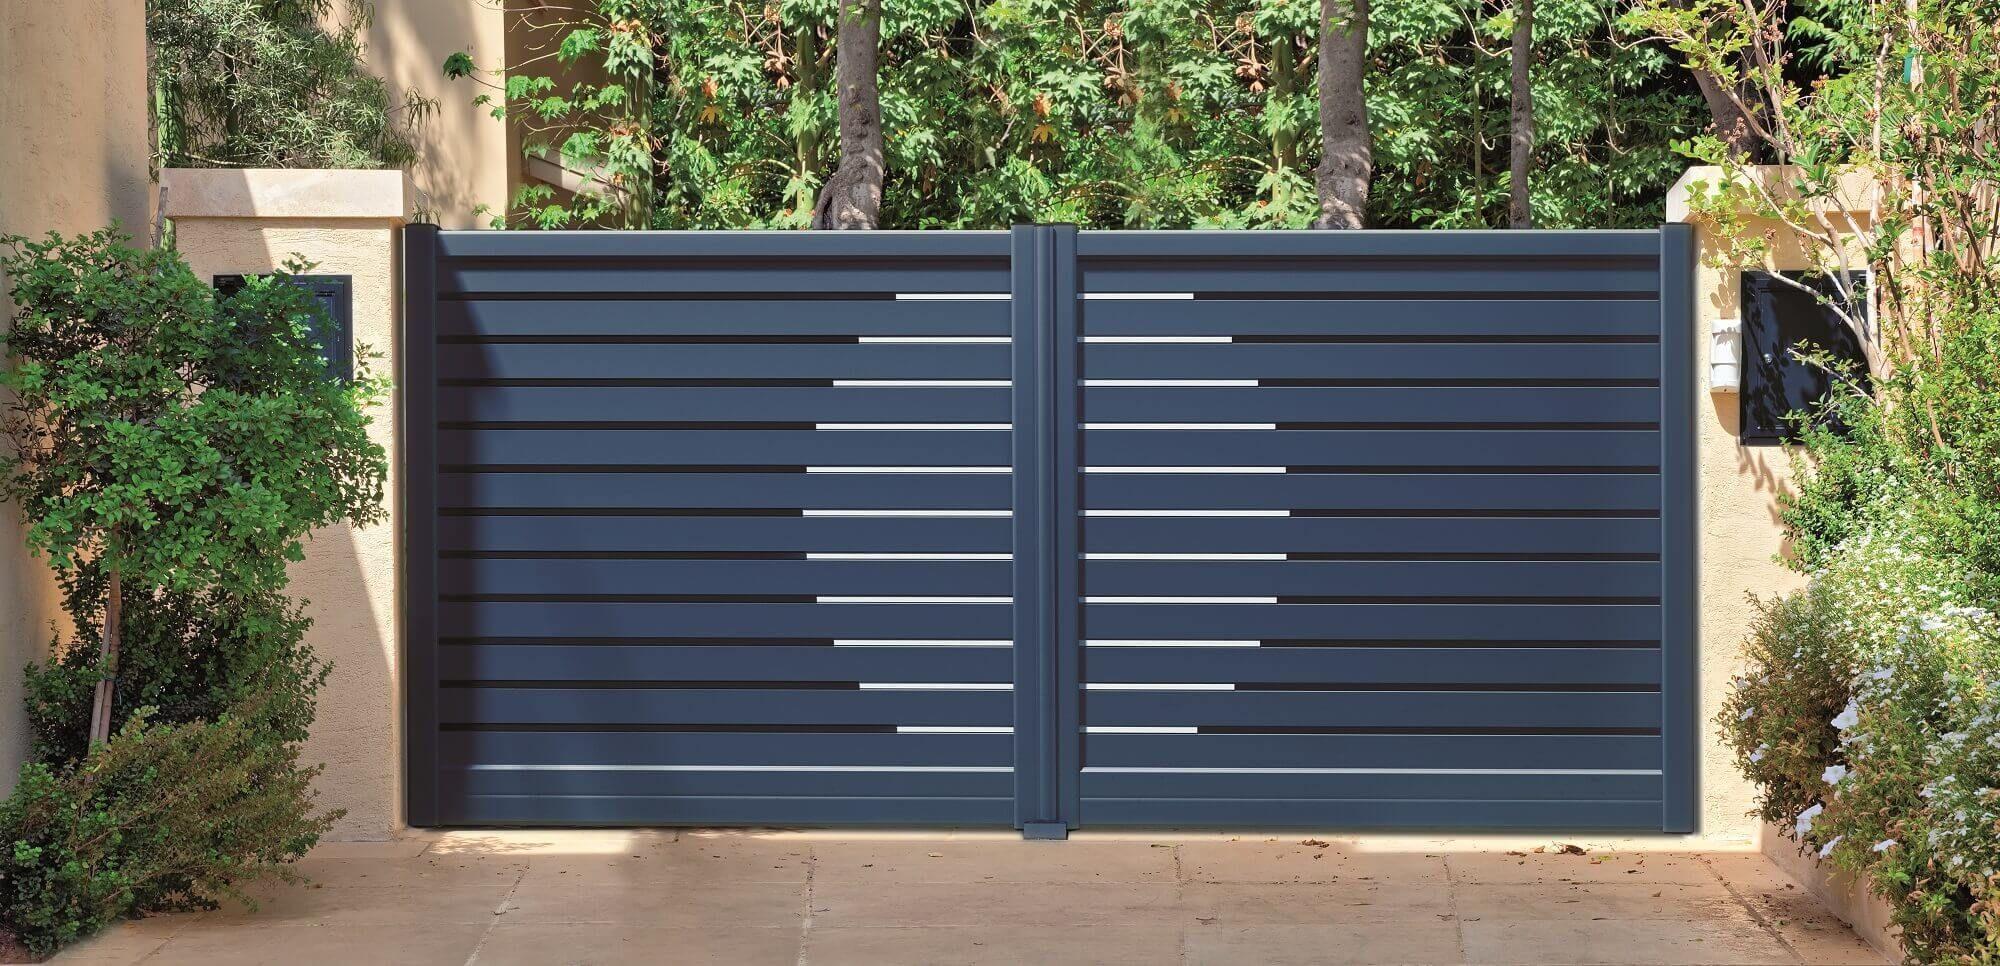 castorama portail pvc chambre americaine pour ado u. Black Bedroom Furniture Sets. Home Design Ideas